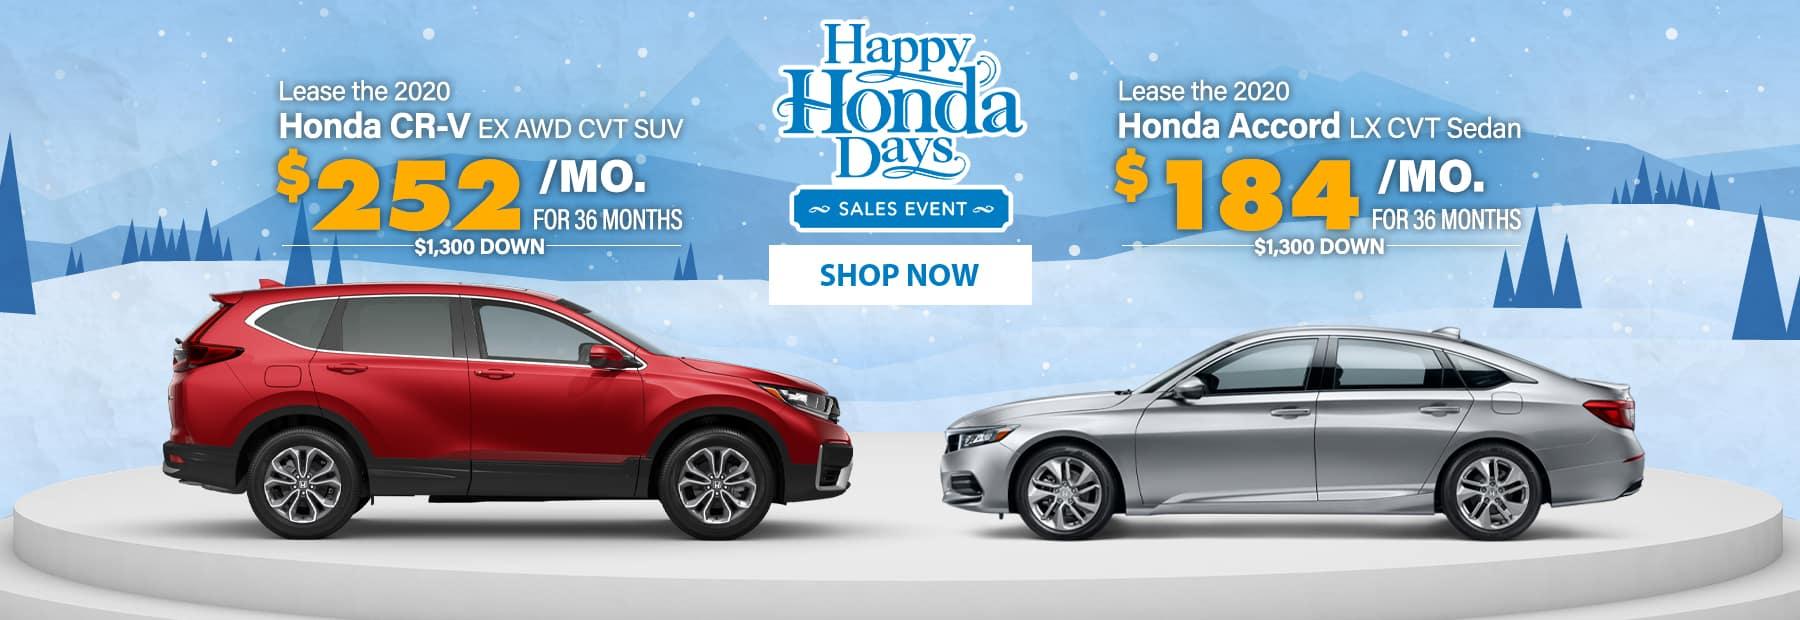 Lease a 2020 Honda CR-V EX AWD CVT SUV or Lease a 2020 Honda Accord LX CVT Sedan